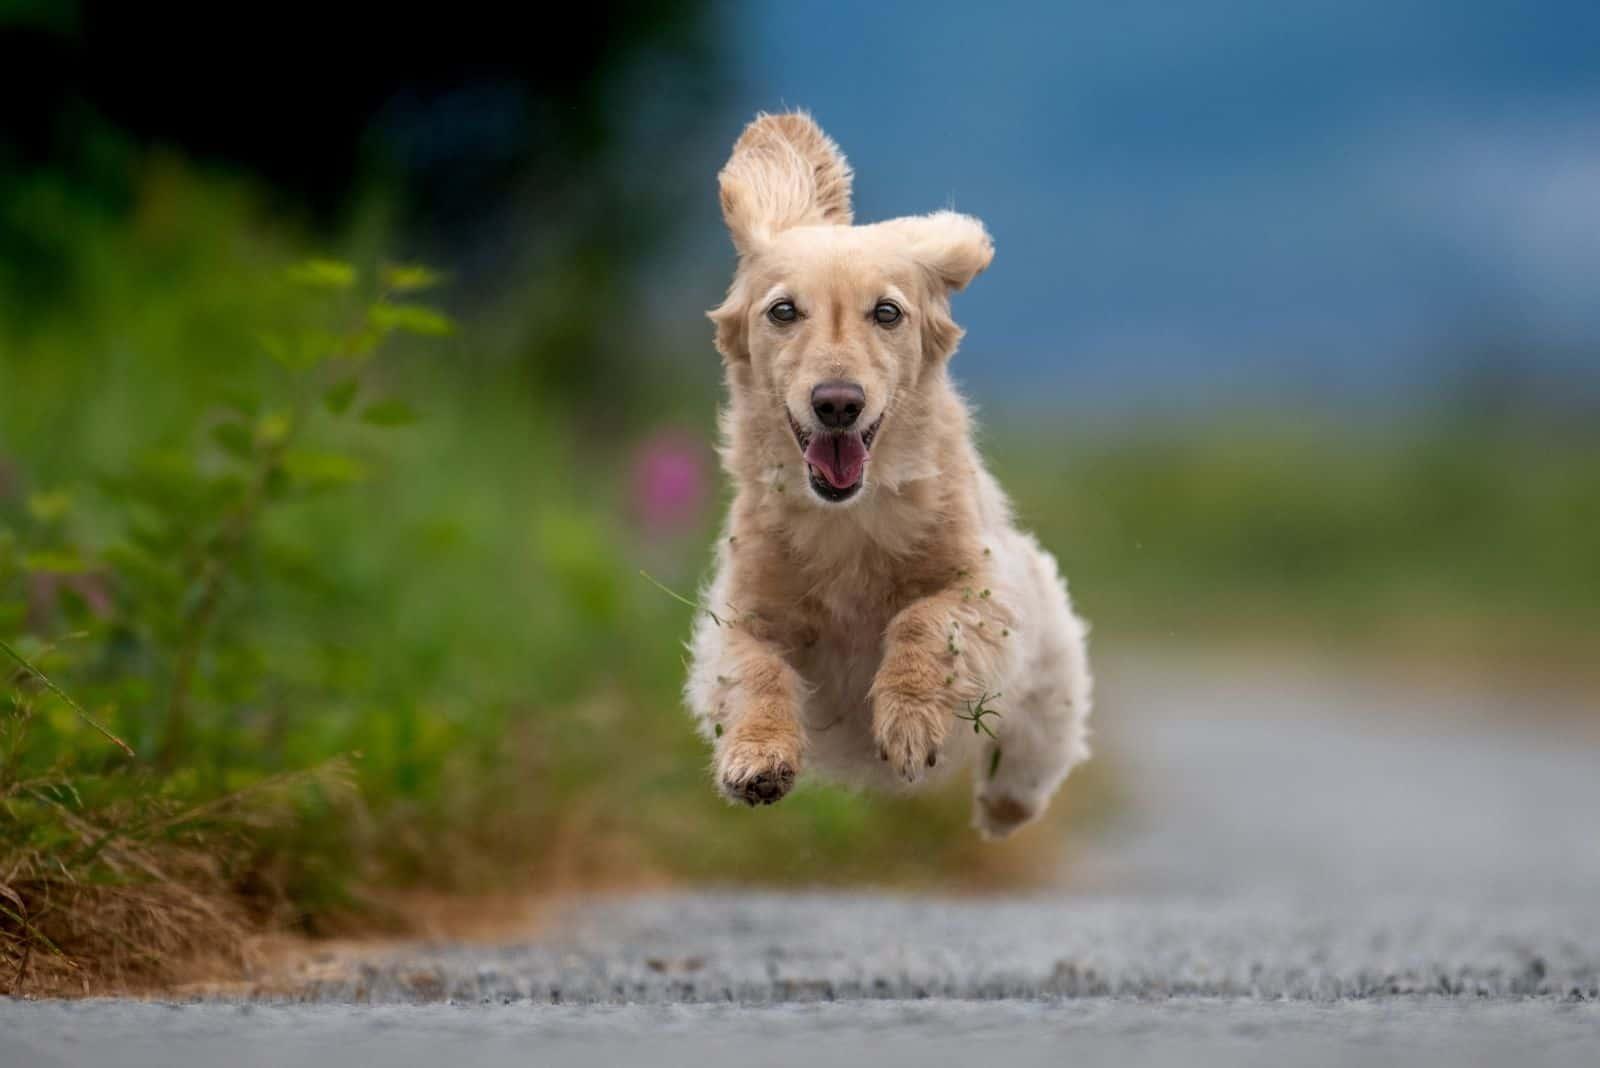 dachshund dog runs with no feet touching the ground